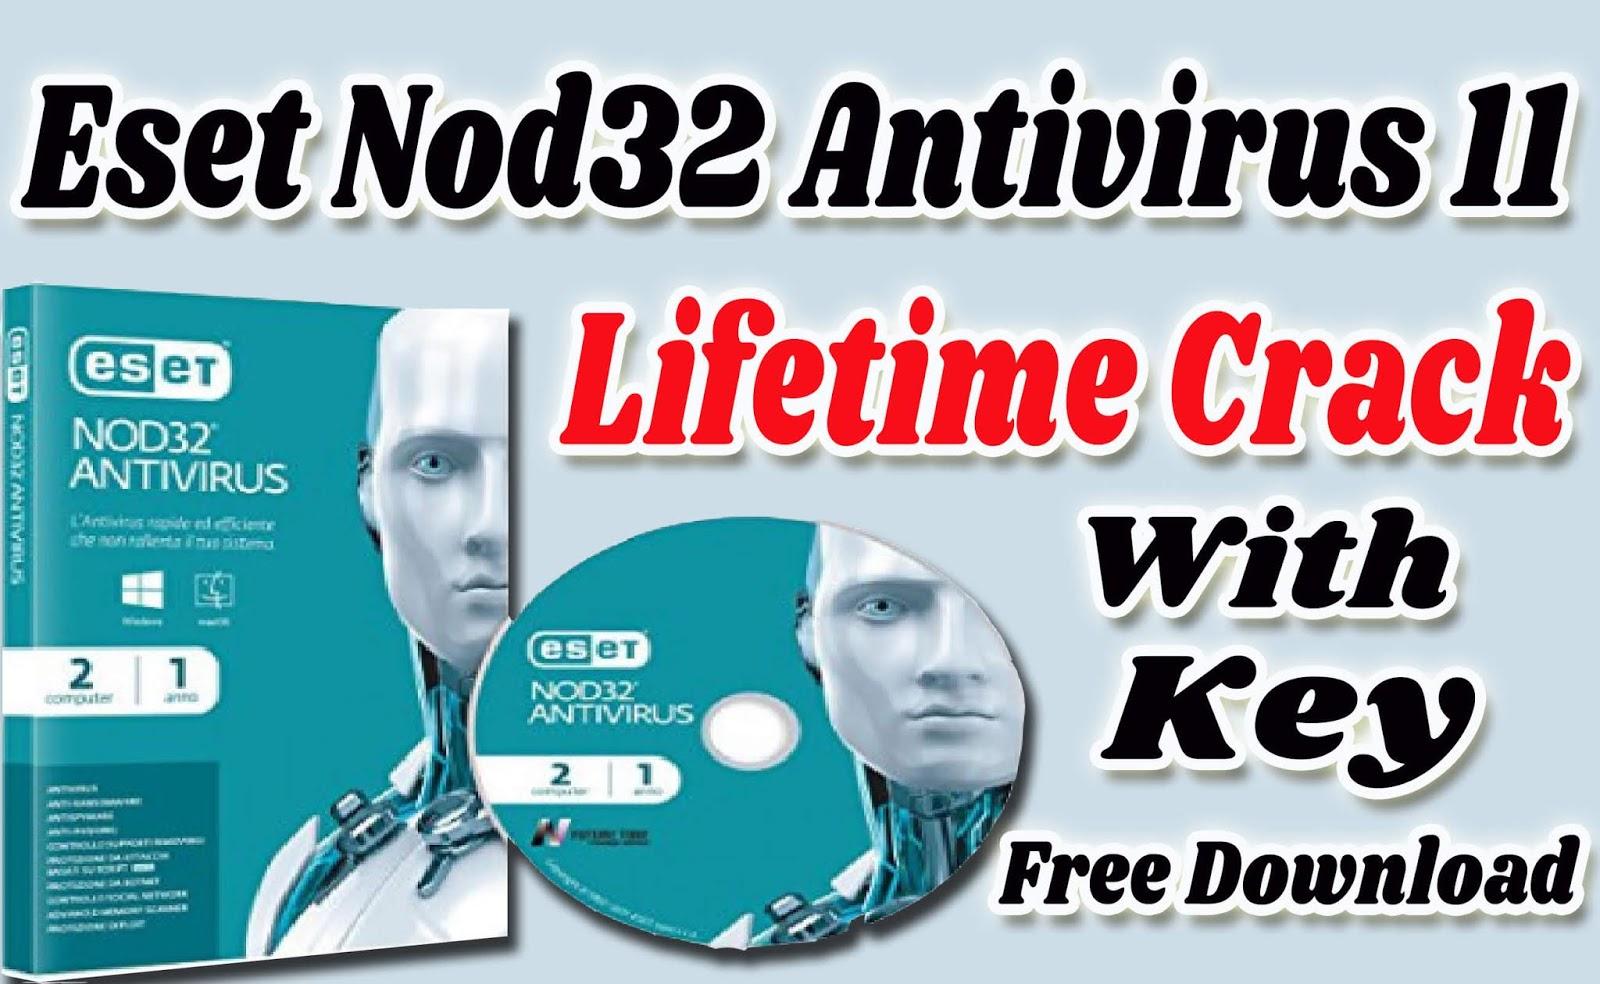 Eset nod32 antivirus 11 licence key